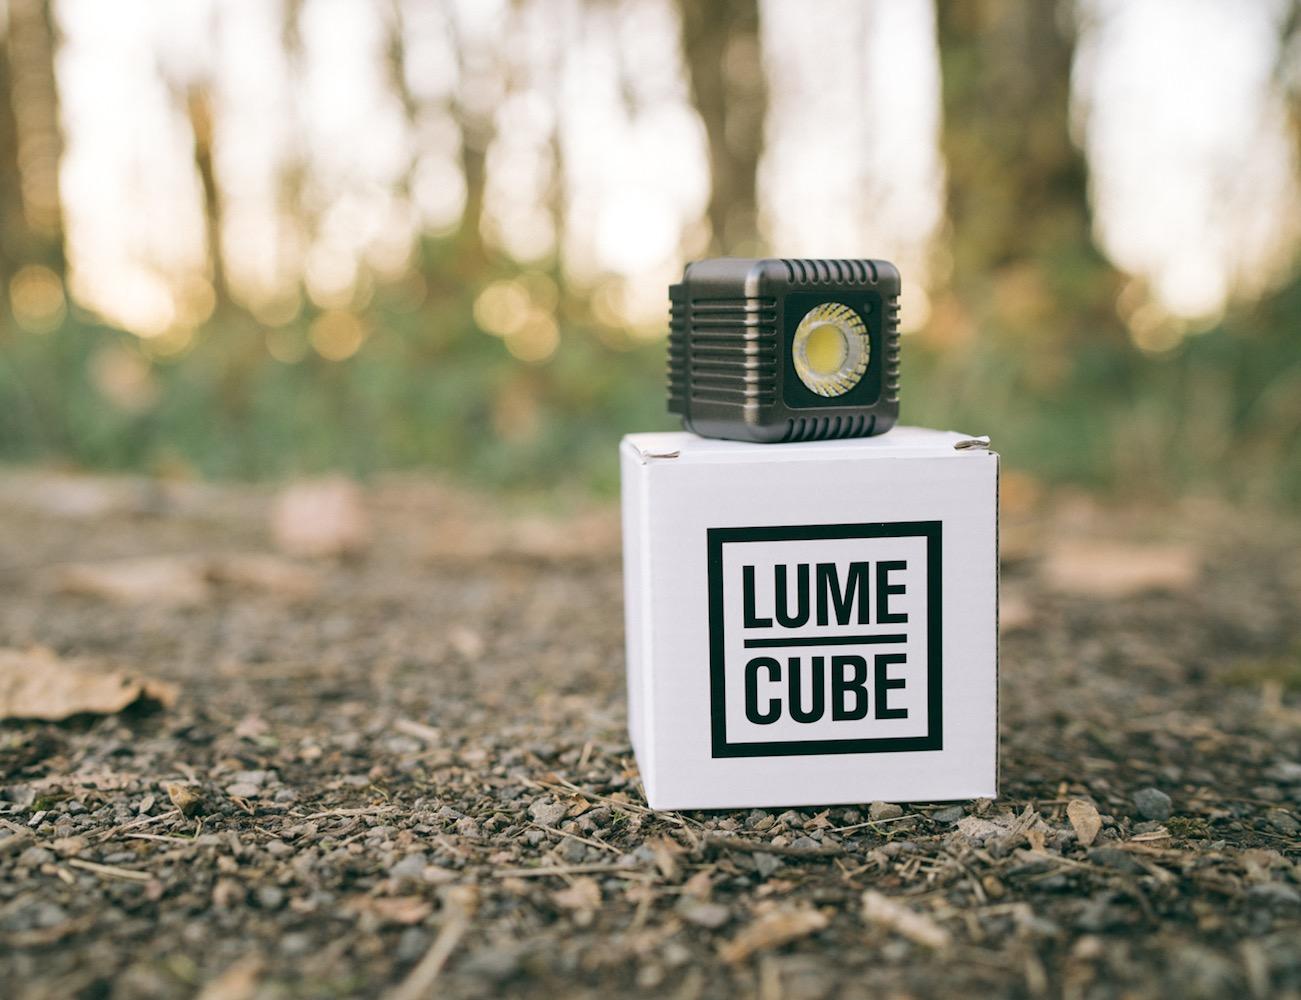 Lume Cube Waterproof Portable Flash